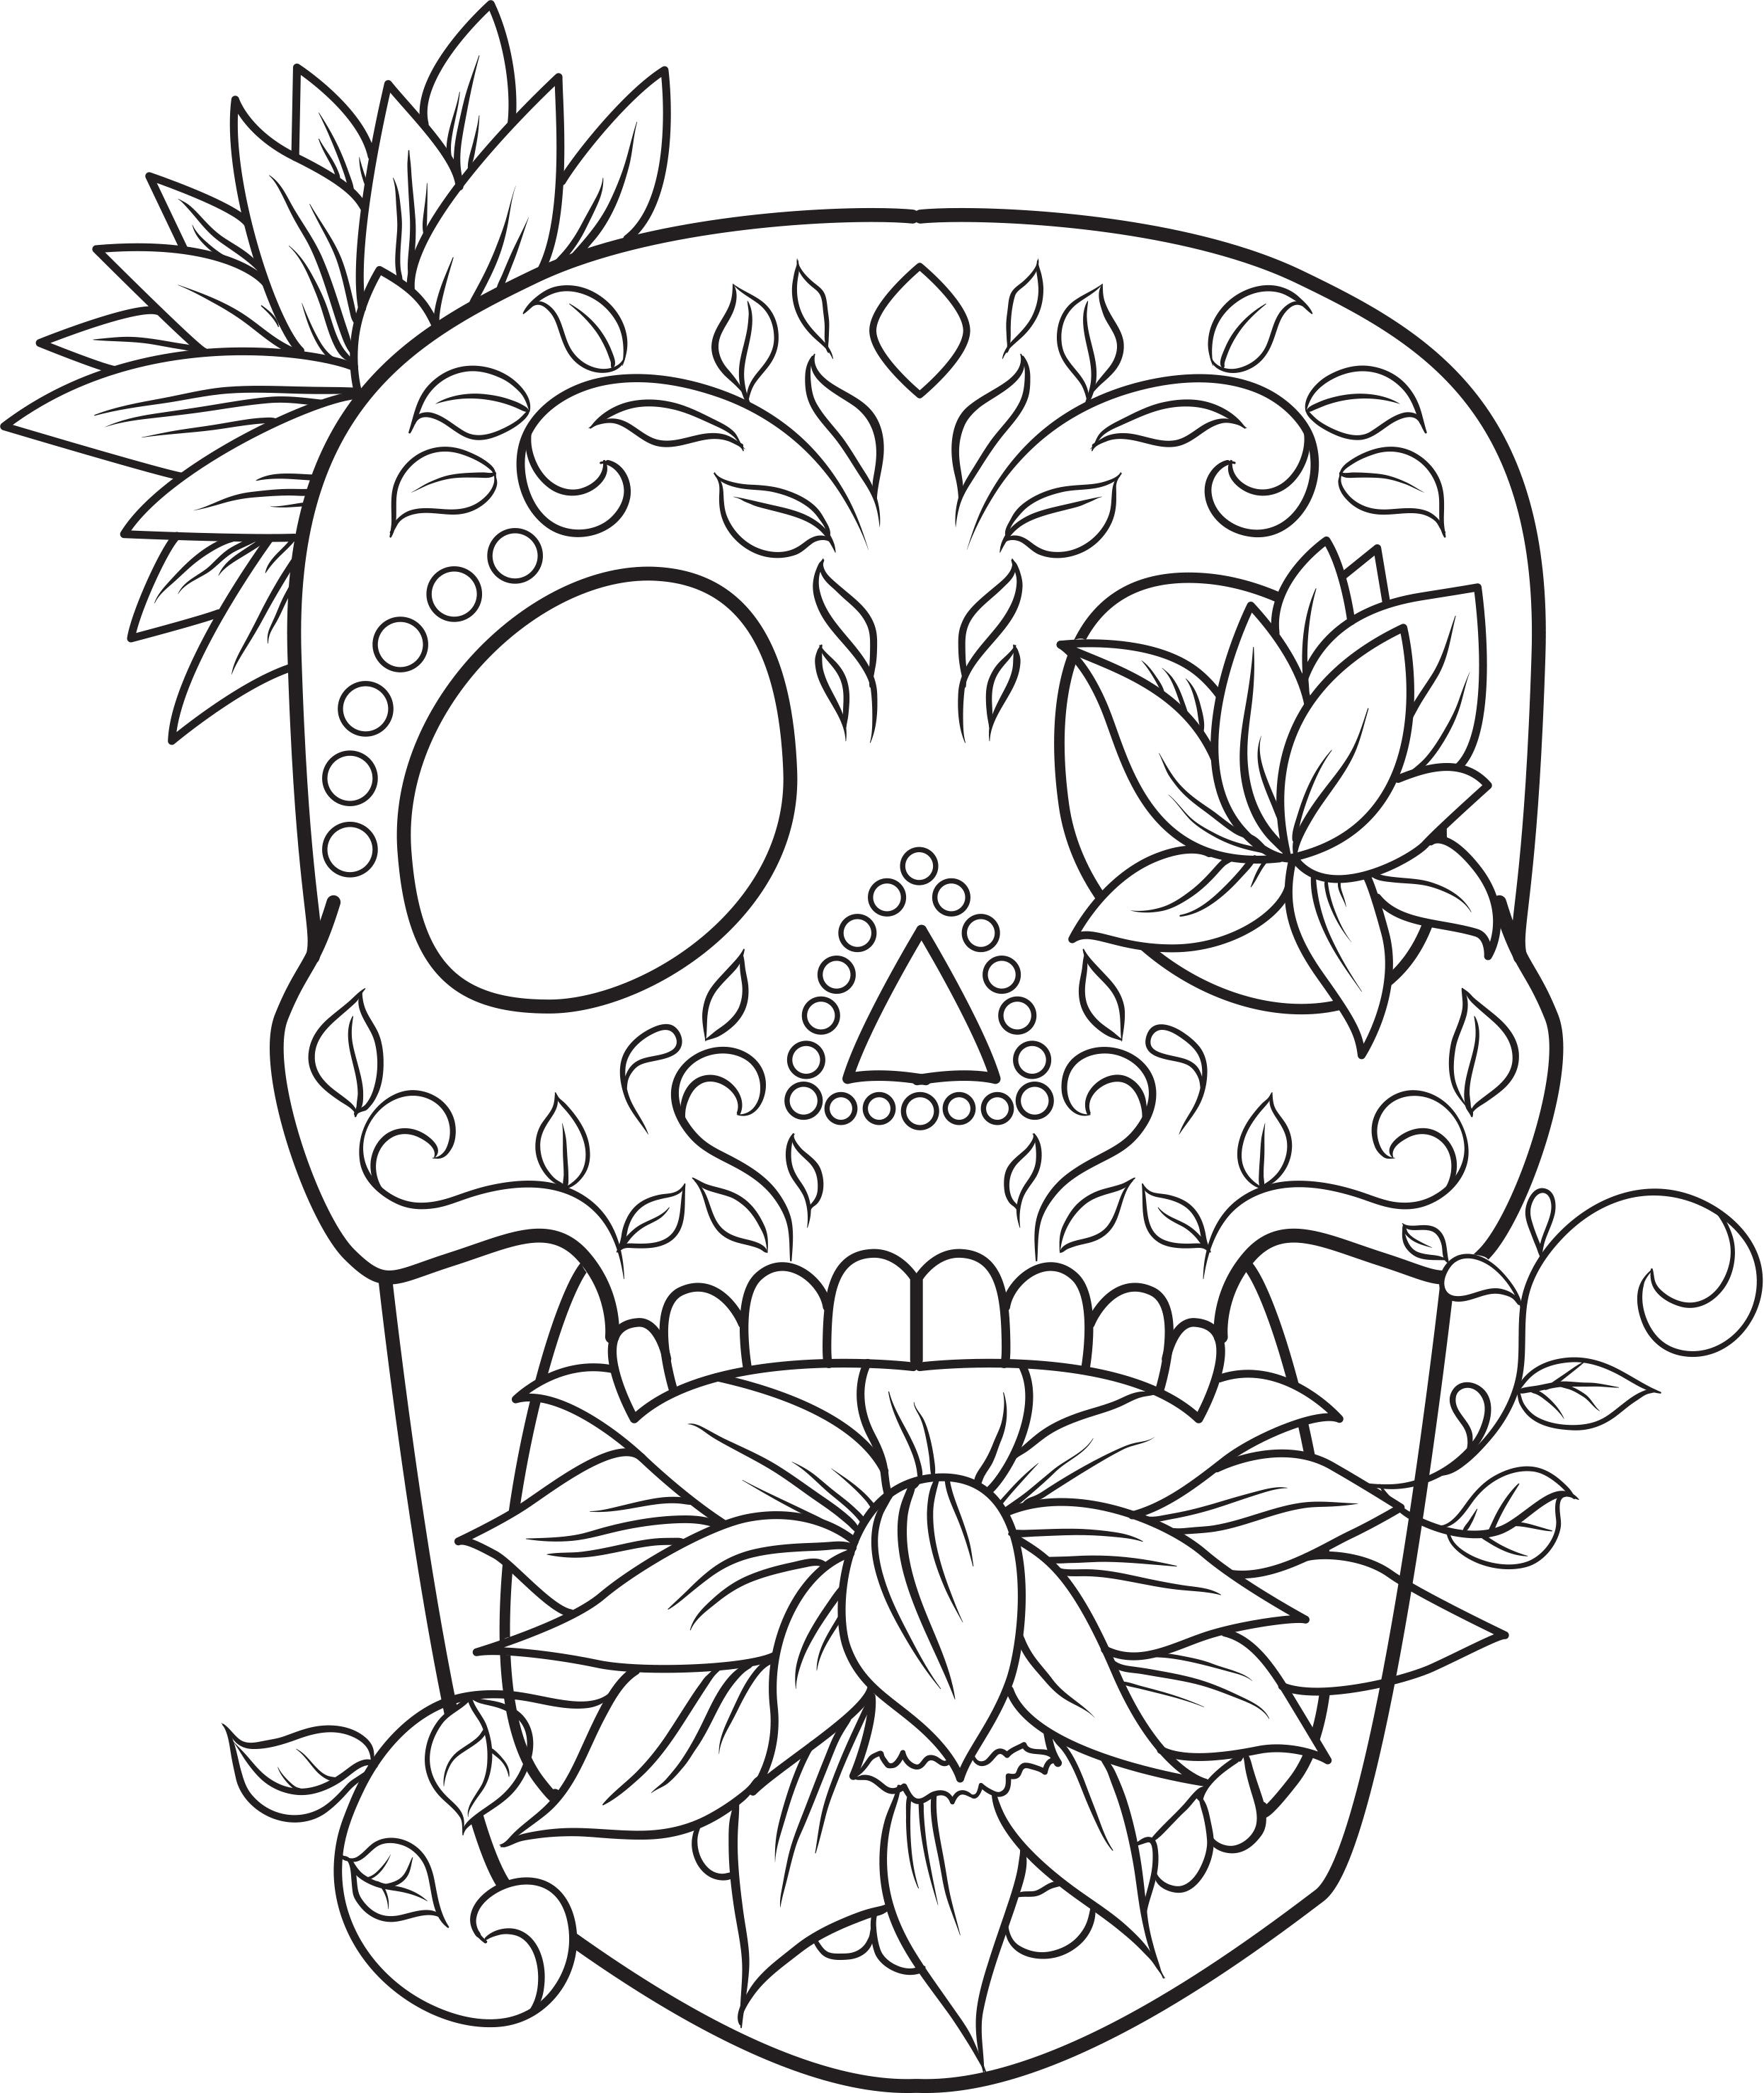 Coloriage Adulte Gratuit Lotus Sugar Skull